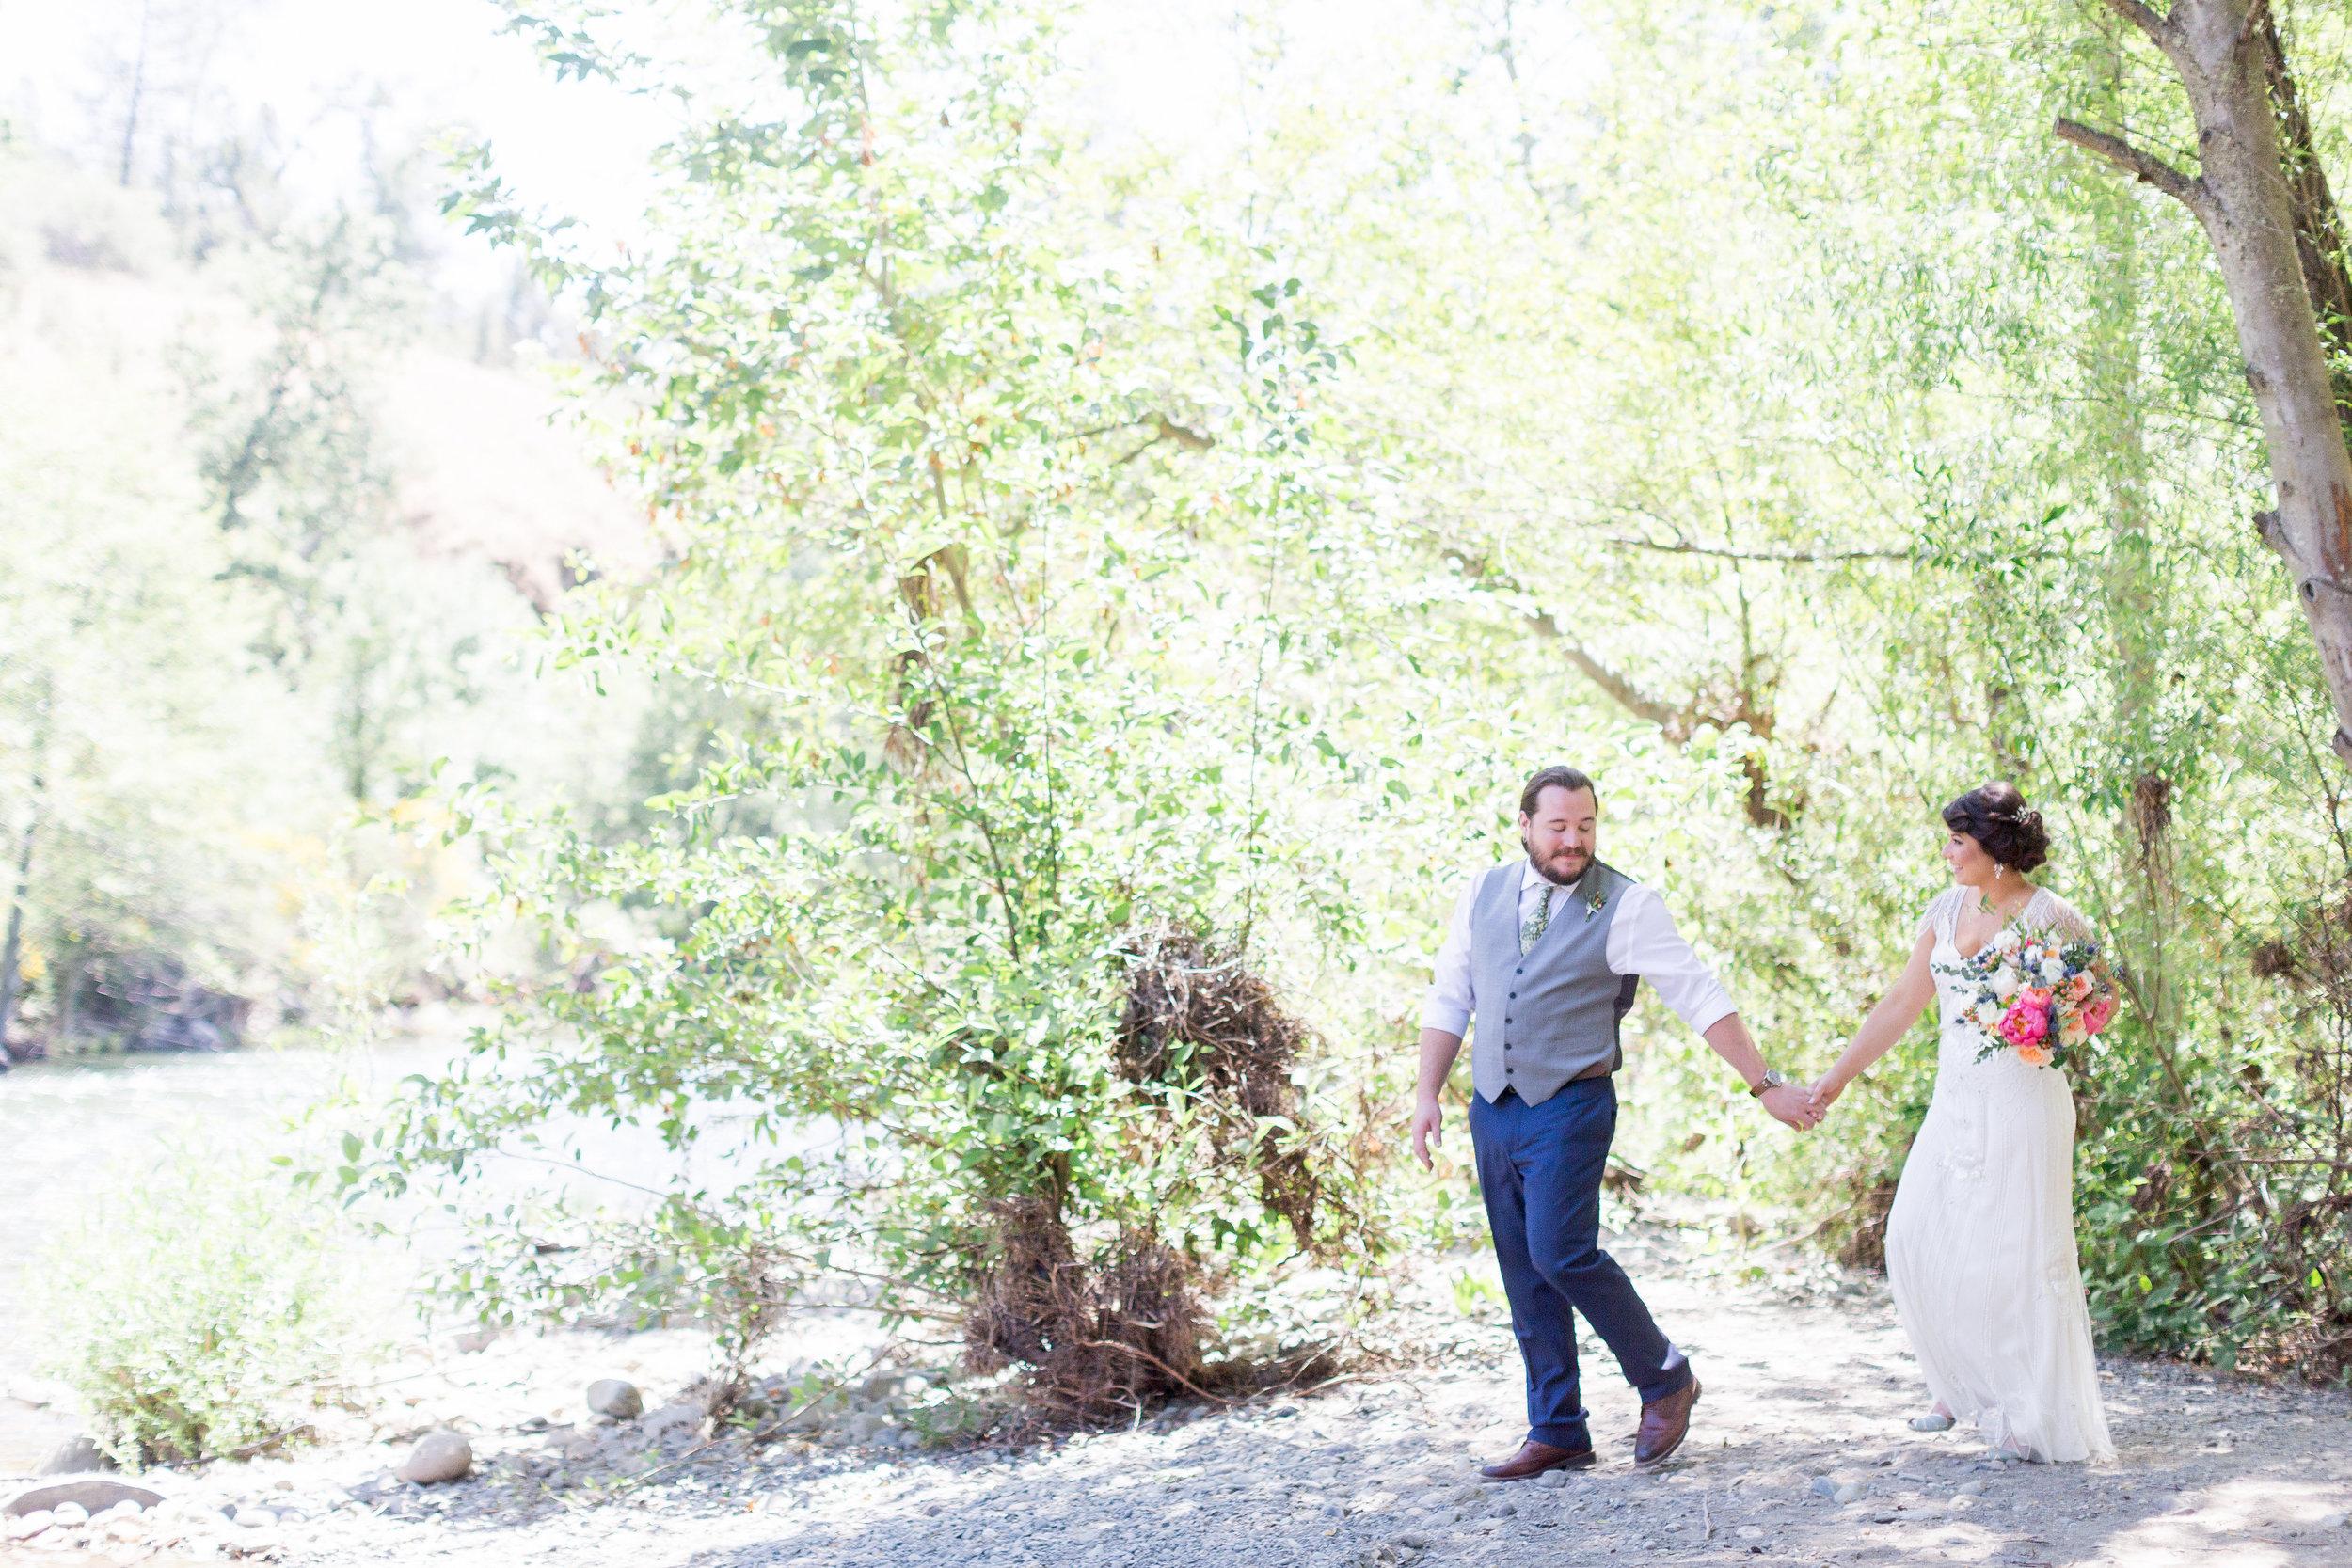 Chase Sabrina-TreCreative Wedding Favorites-0022.jpg